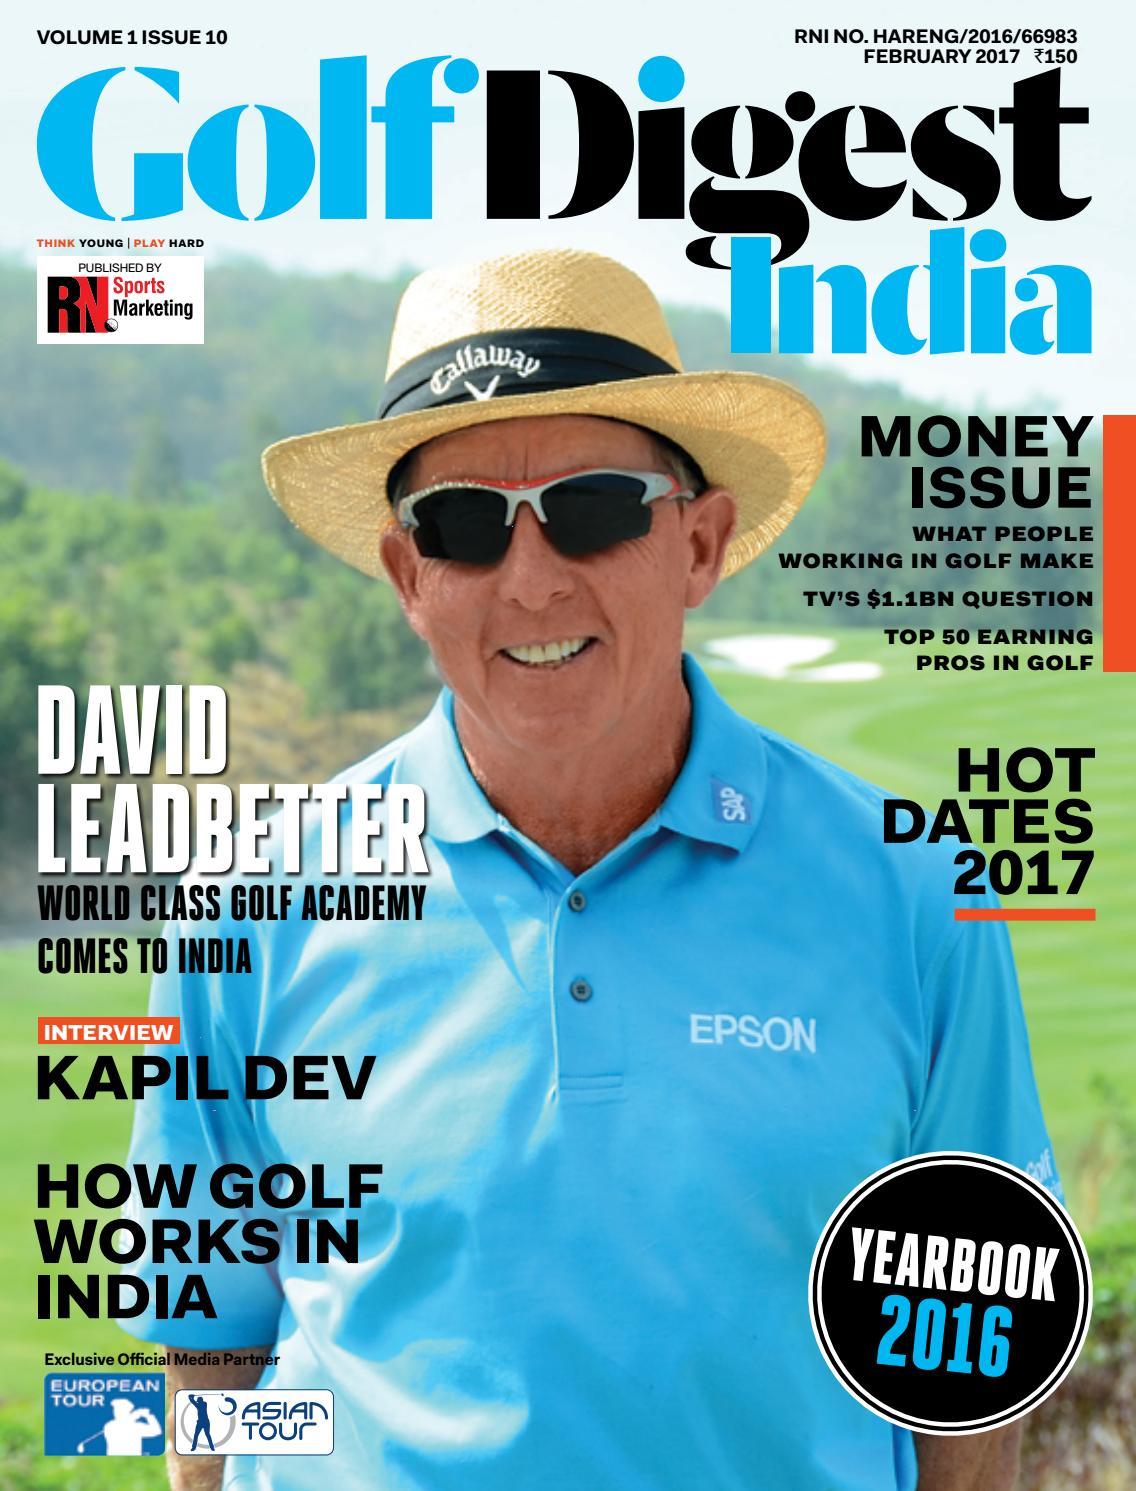 fafa6b938e9 Golf Digest India - February 2017 by Golf Digest India - issuu